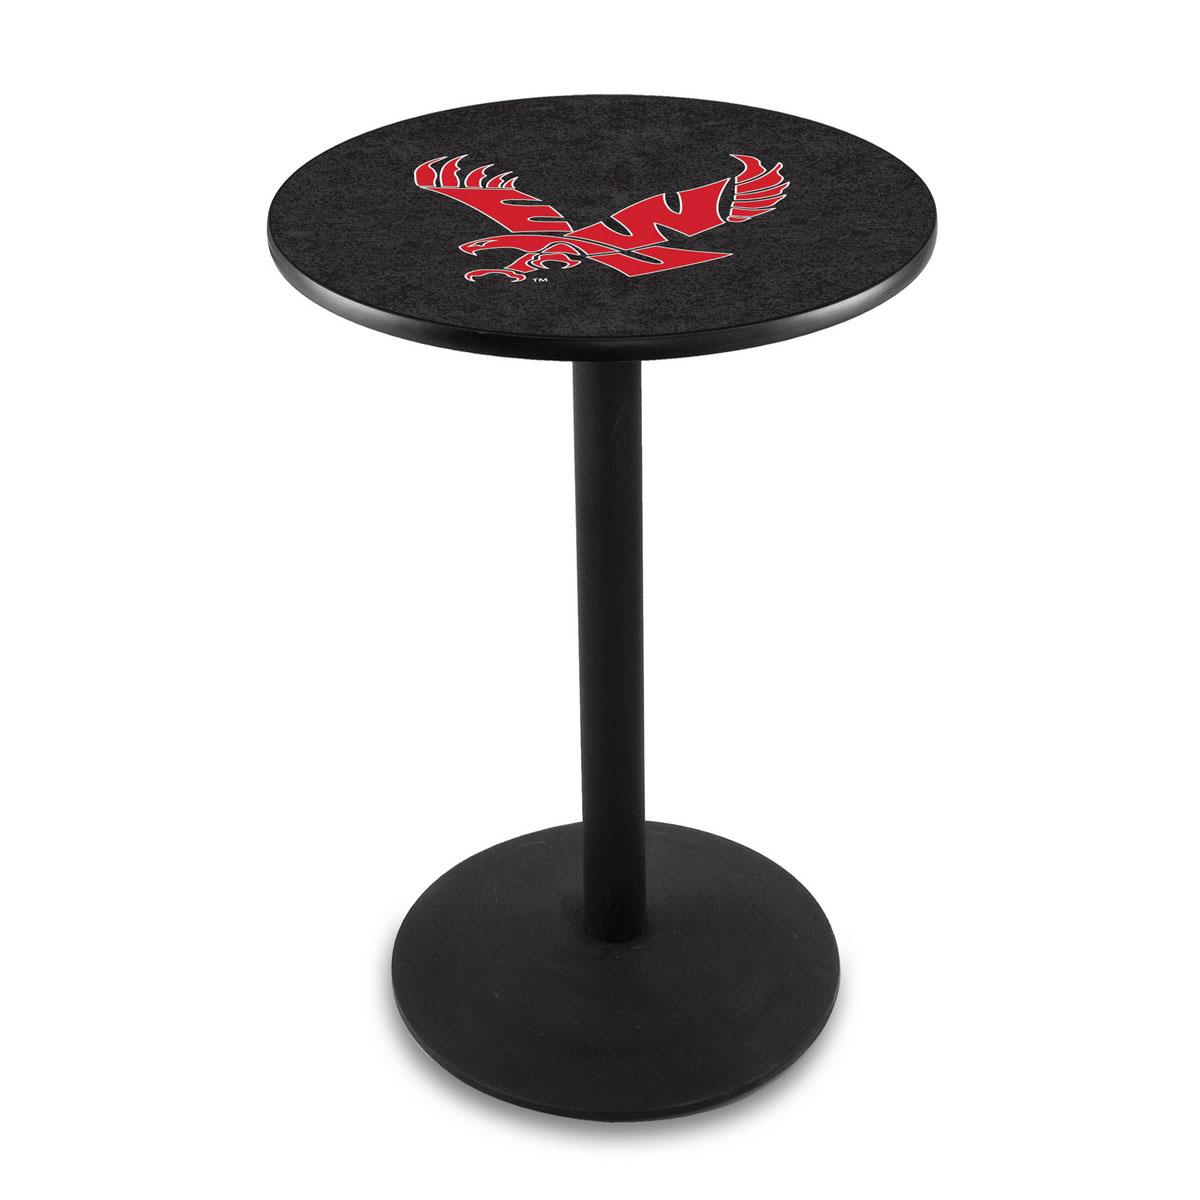 Cheap Eastern Washington University Logo Pub Bar Table Round Stand Product Photo